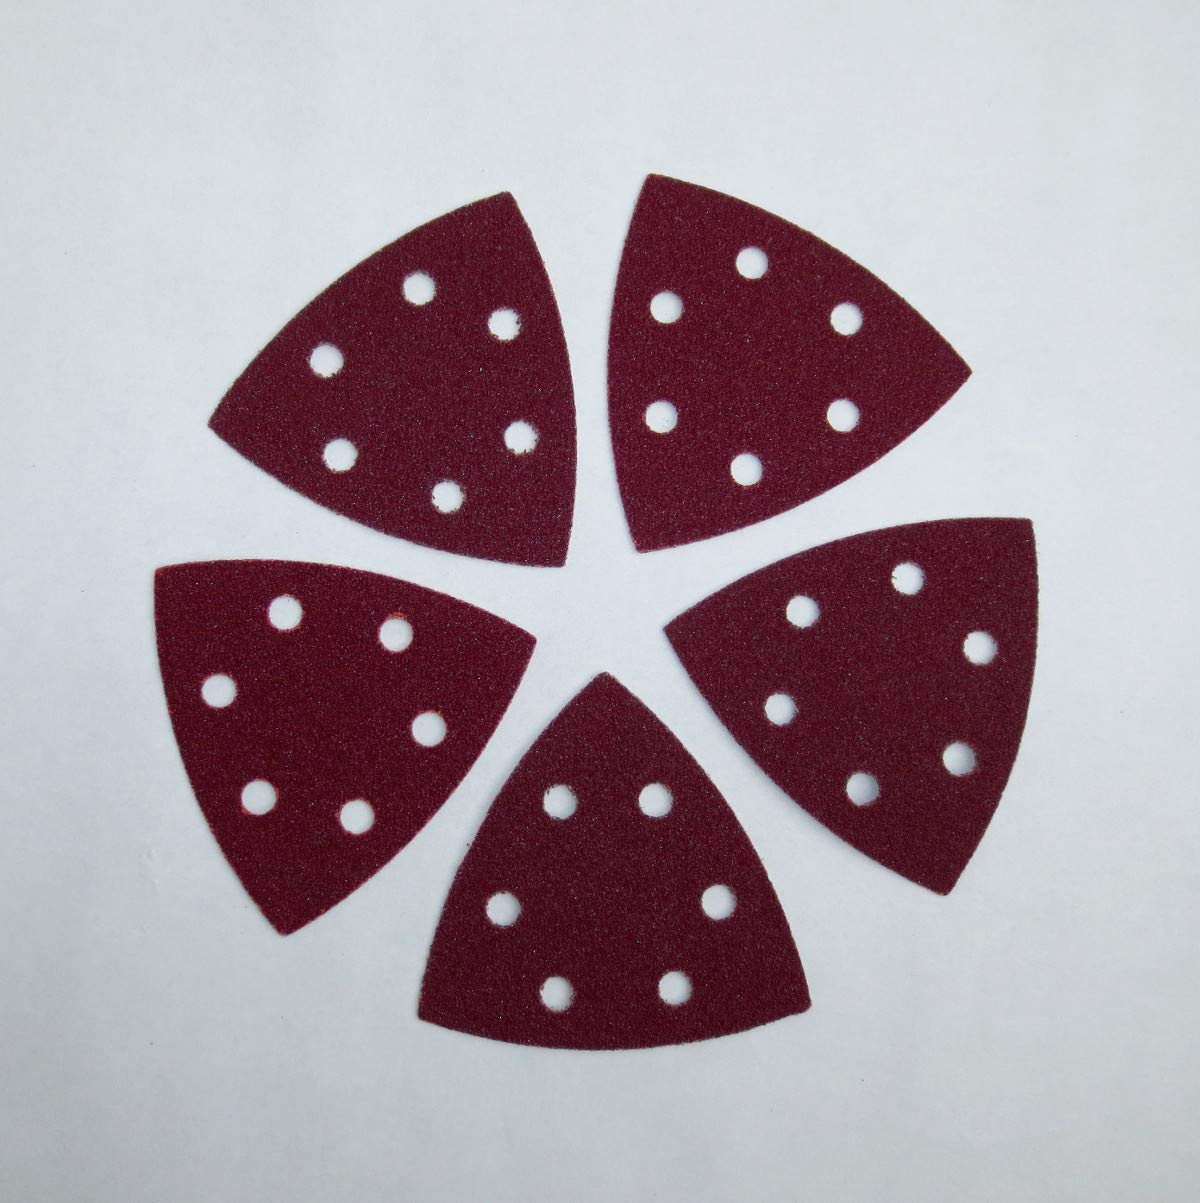 100 molienda triangular 6 agujeros de terciopelo 93 x 93 x ...